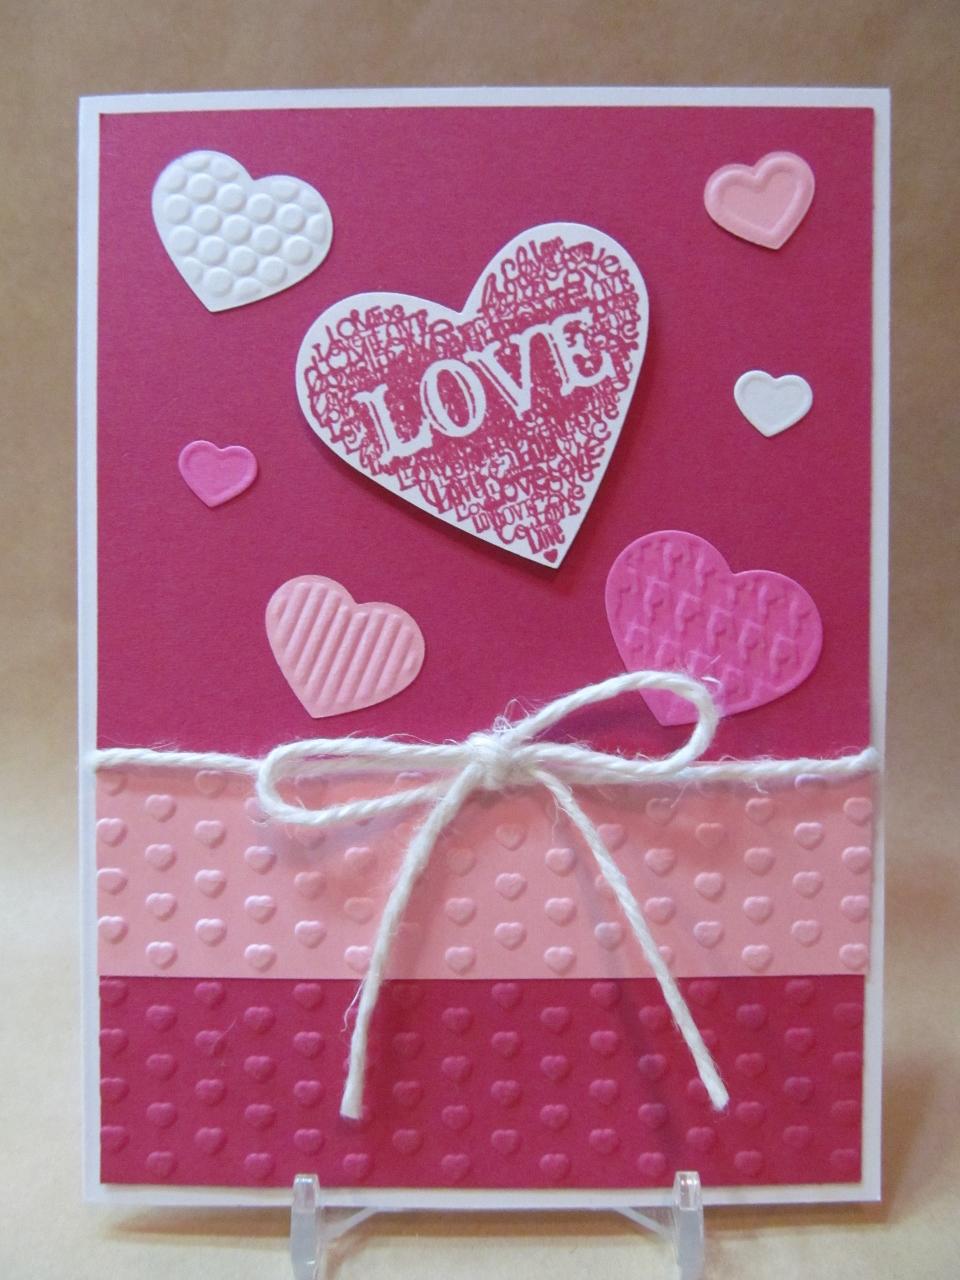 Savvy Handmade Cards Embossed Love Card